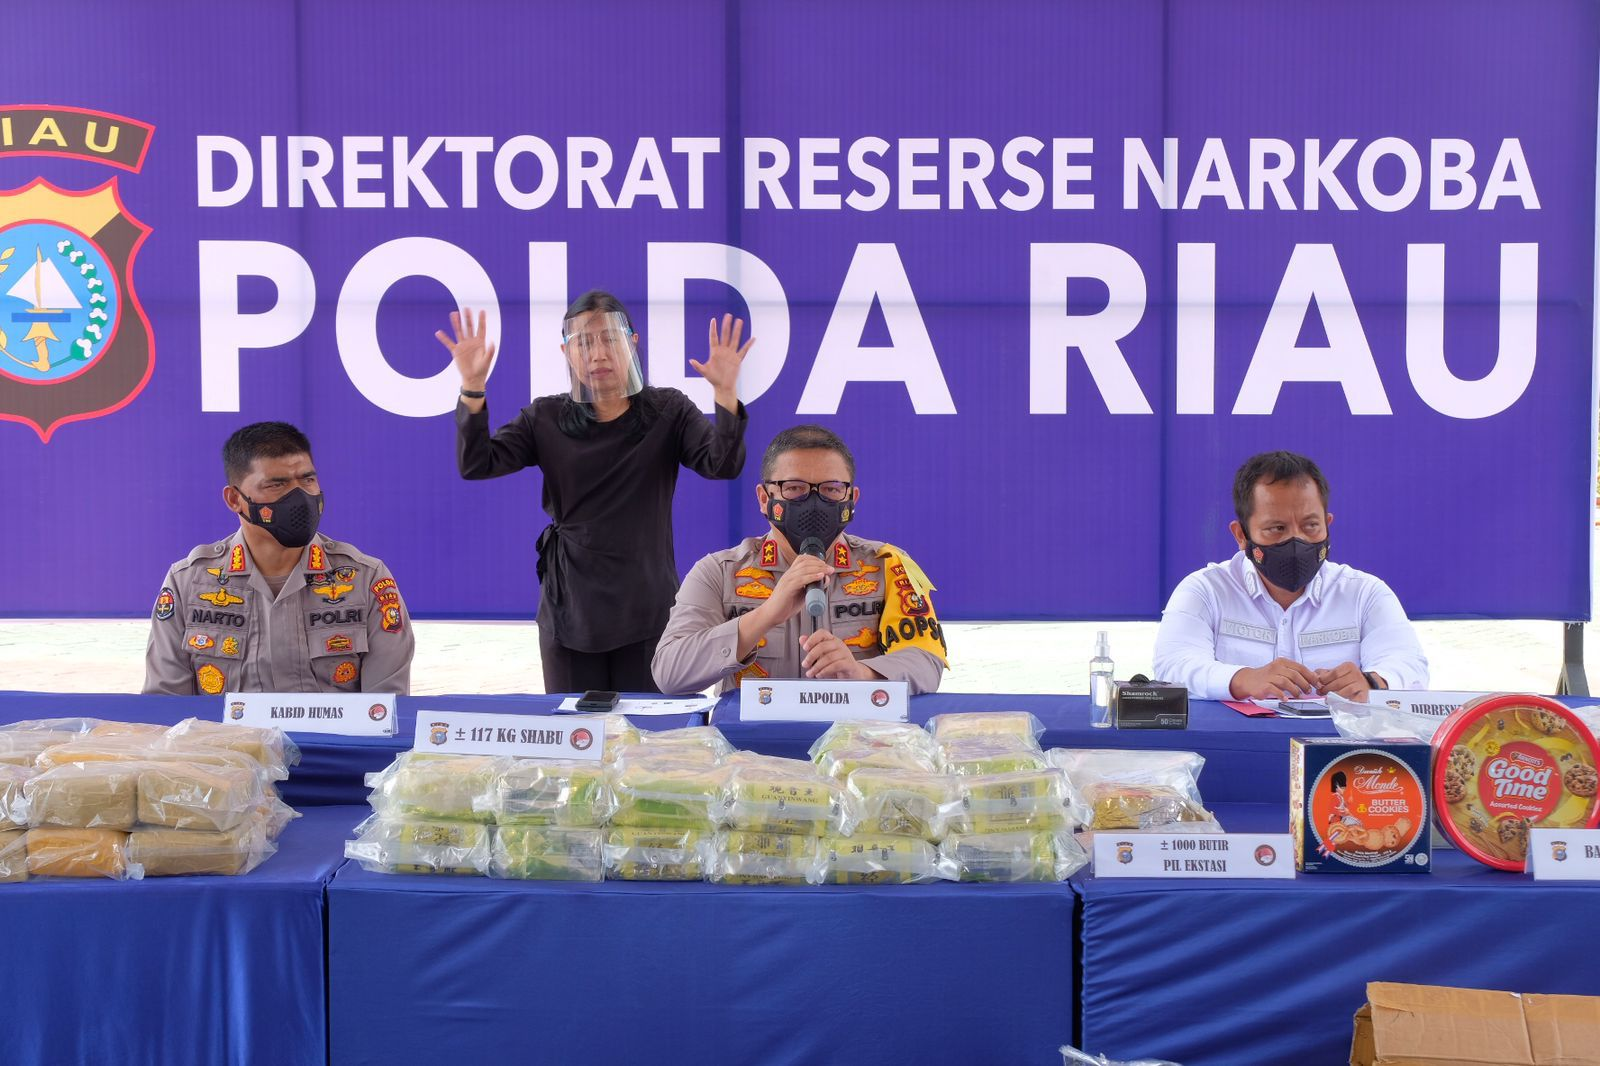 Bongkar 7 Jaringan Narkoba Asal Malaysia, Polda Riau Sita Barang Bukti 117 Kg Sabu & 1.000 Pil